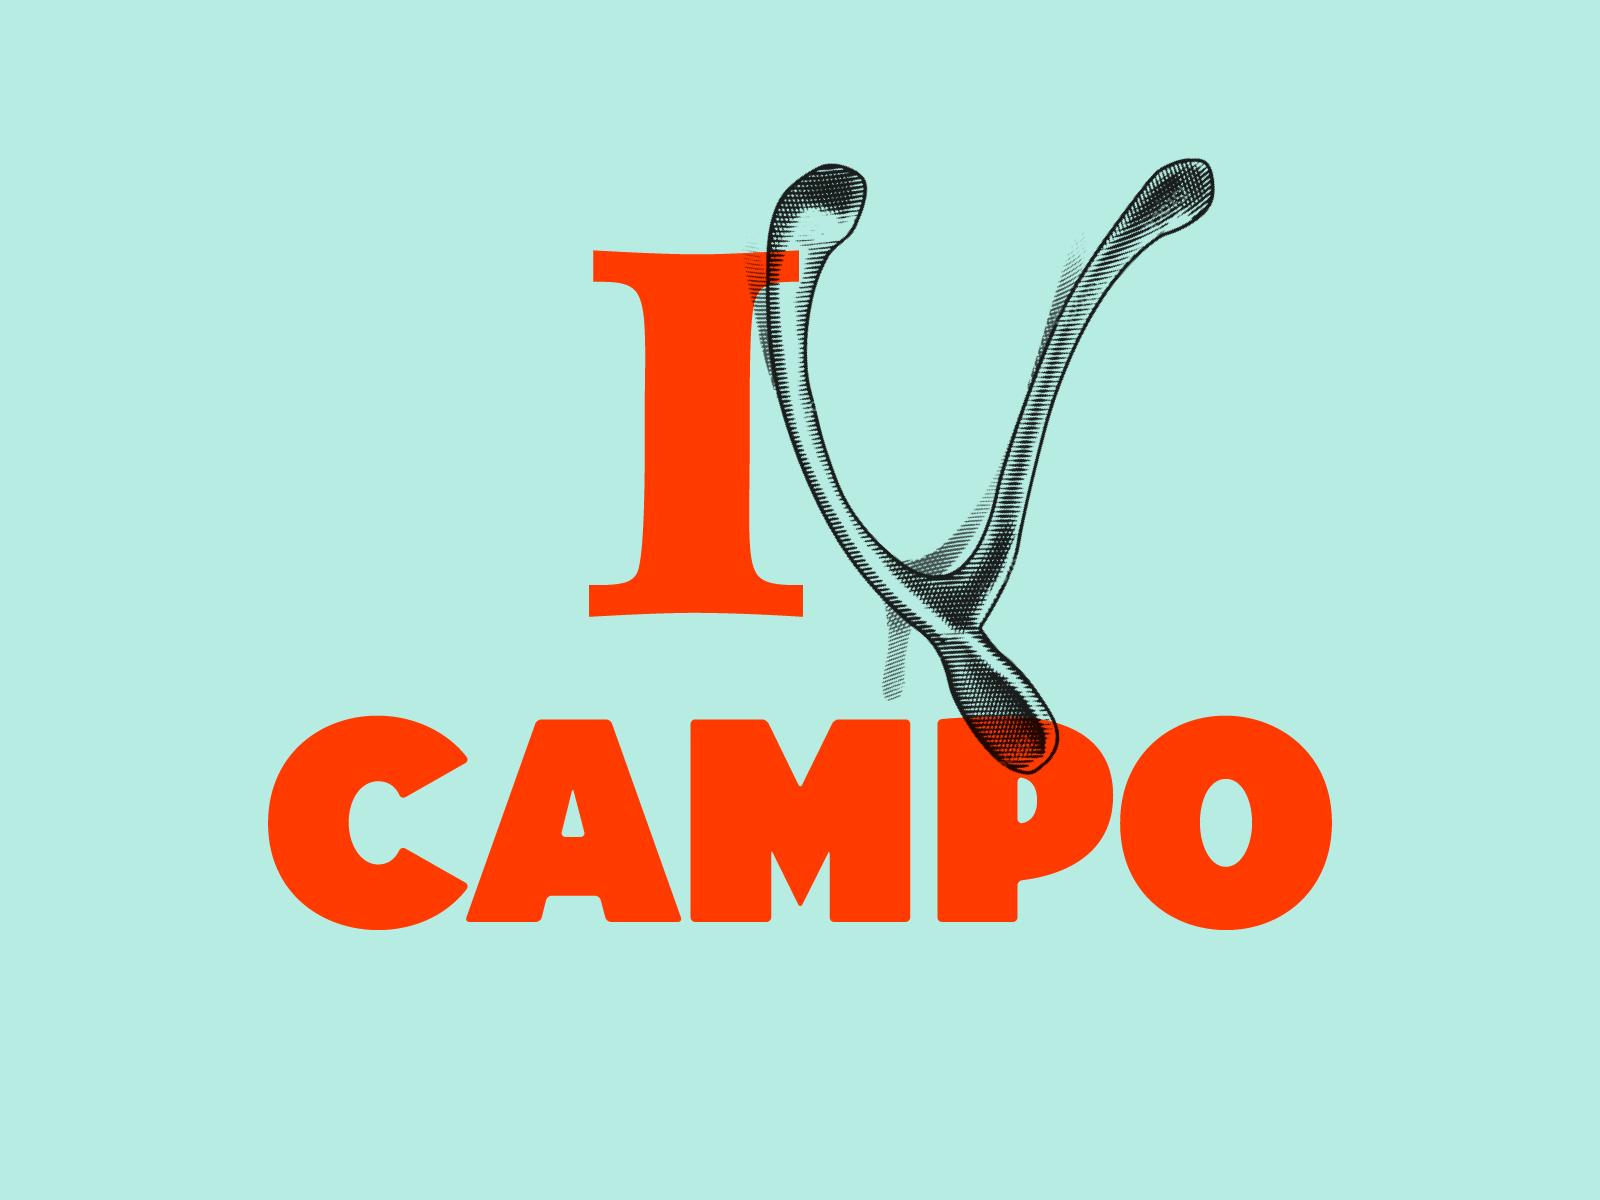 Campo-FB-Posts_M01-7